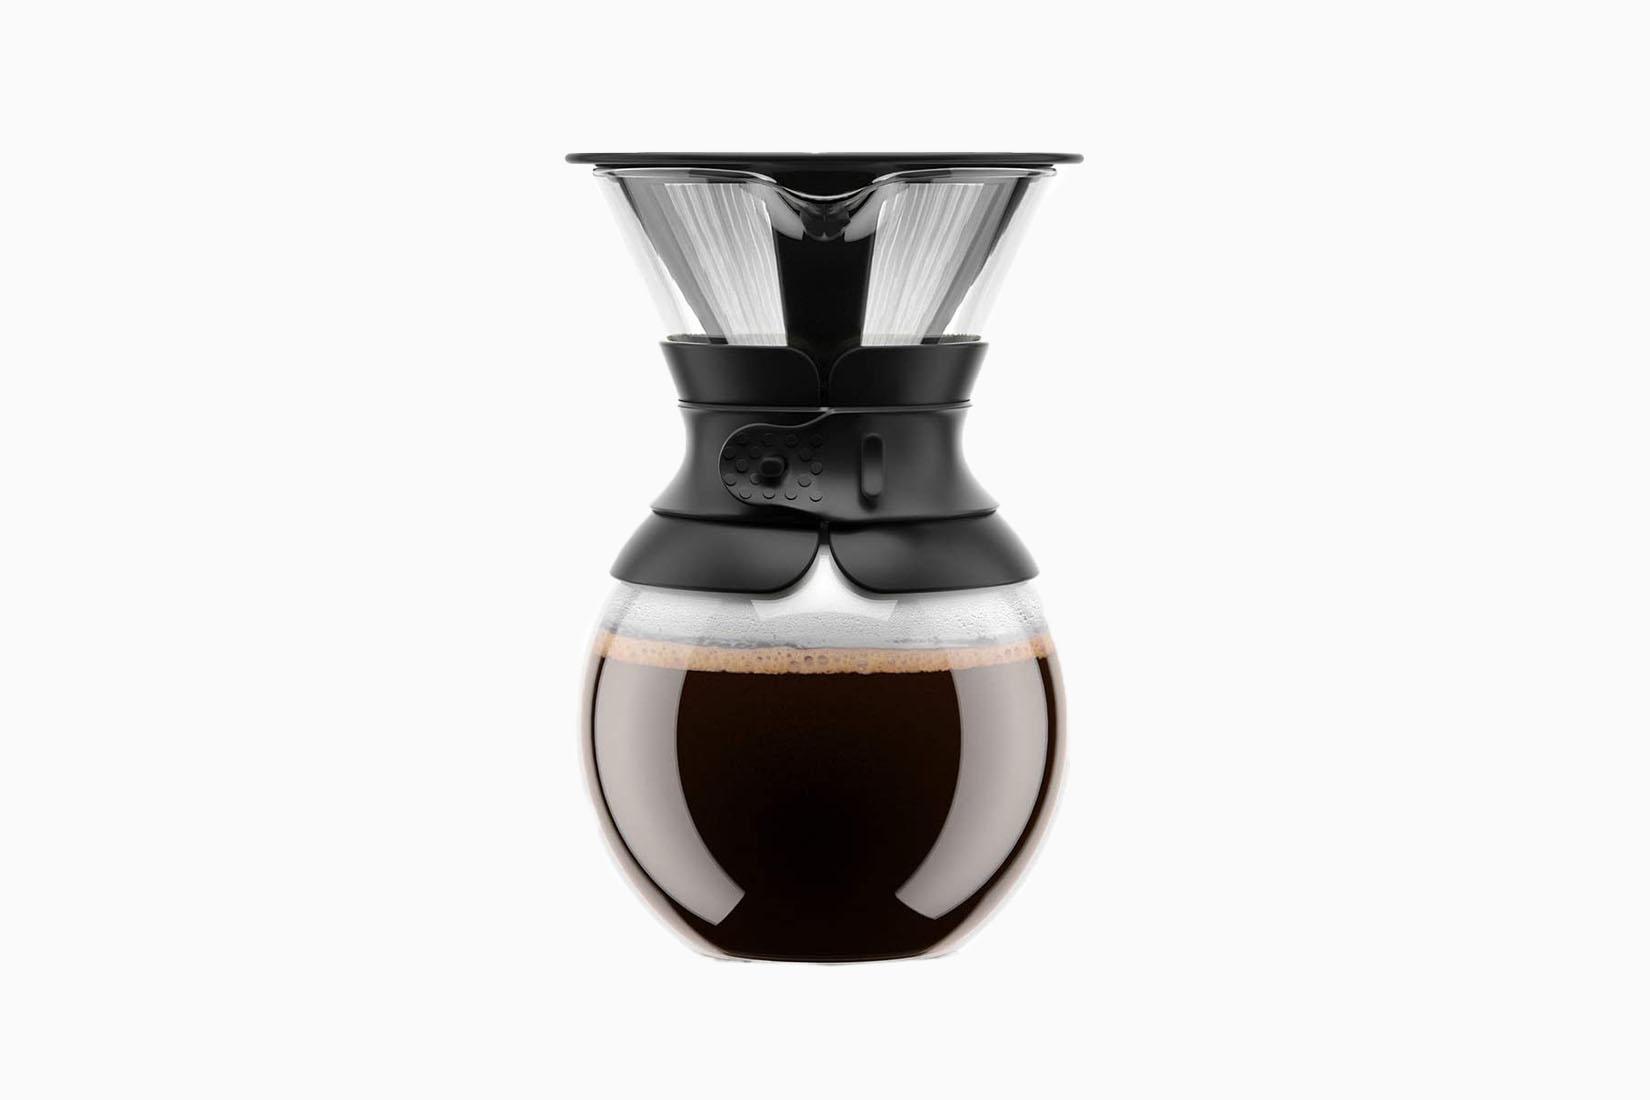 best drip coffee makers bodum review Luxe Digital